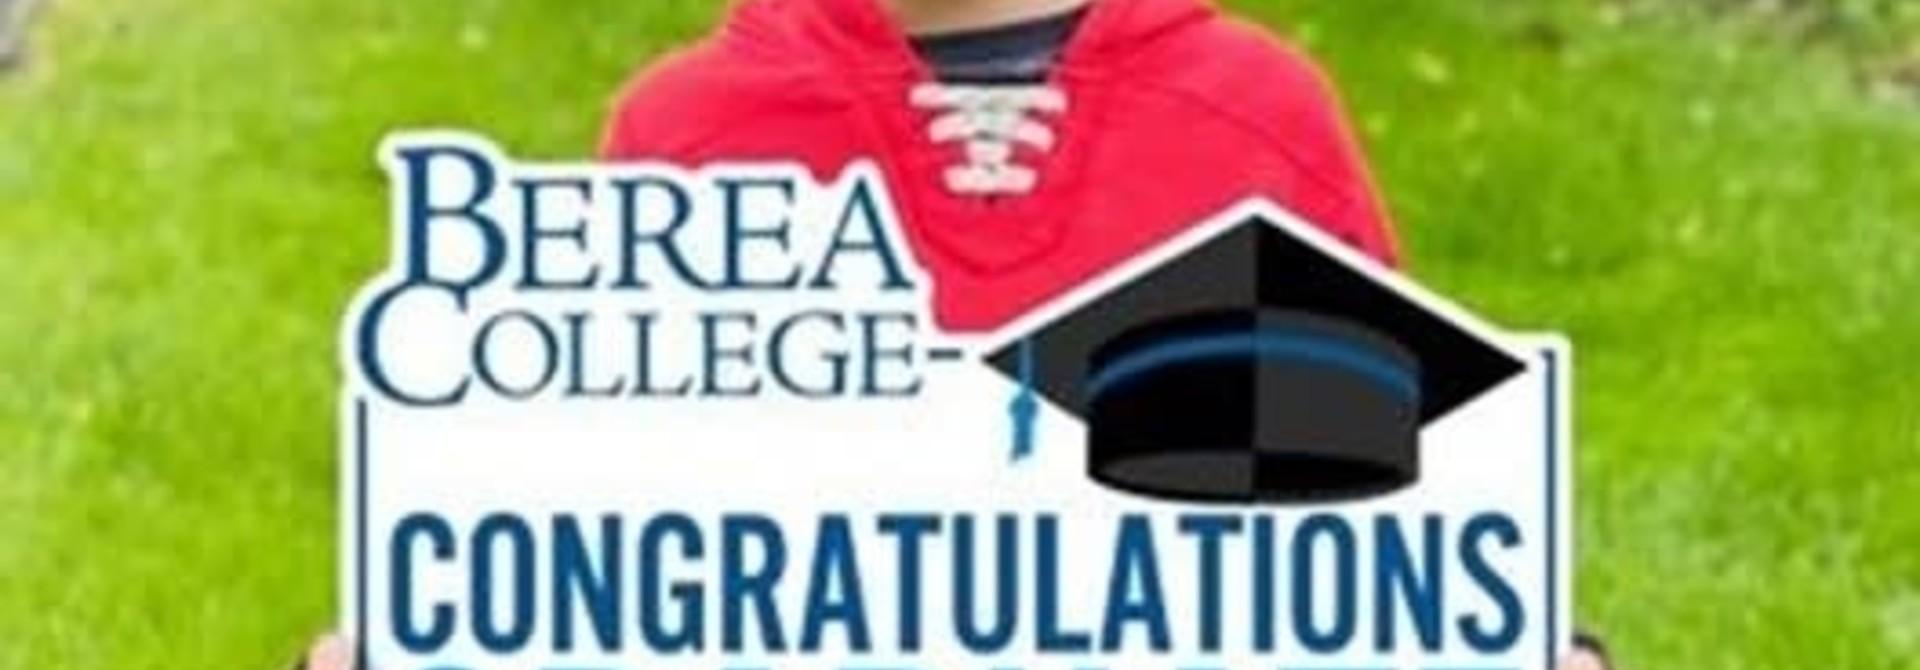 Mountaineers Congratulations Graduate Yard Sign*